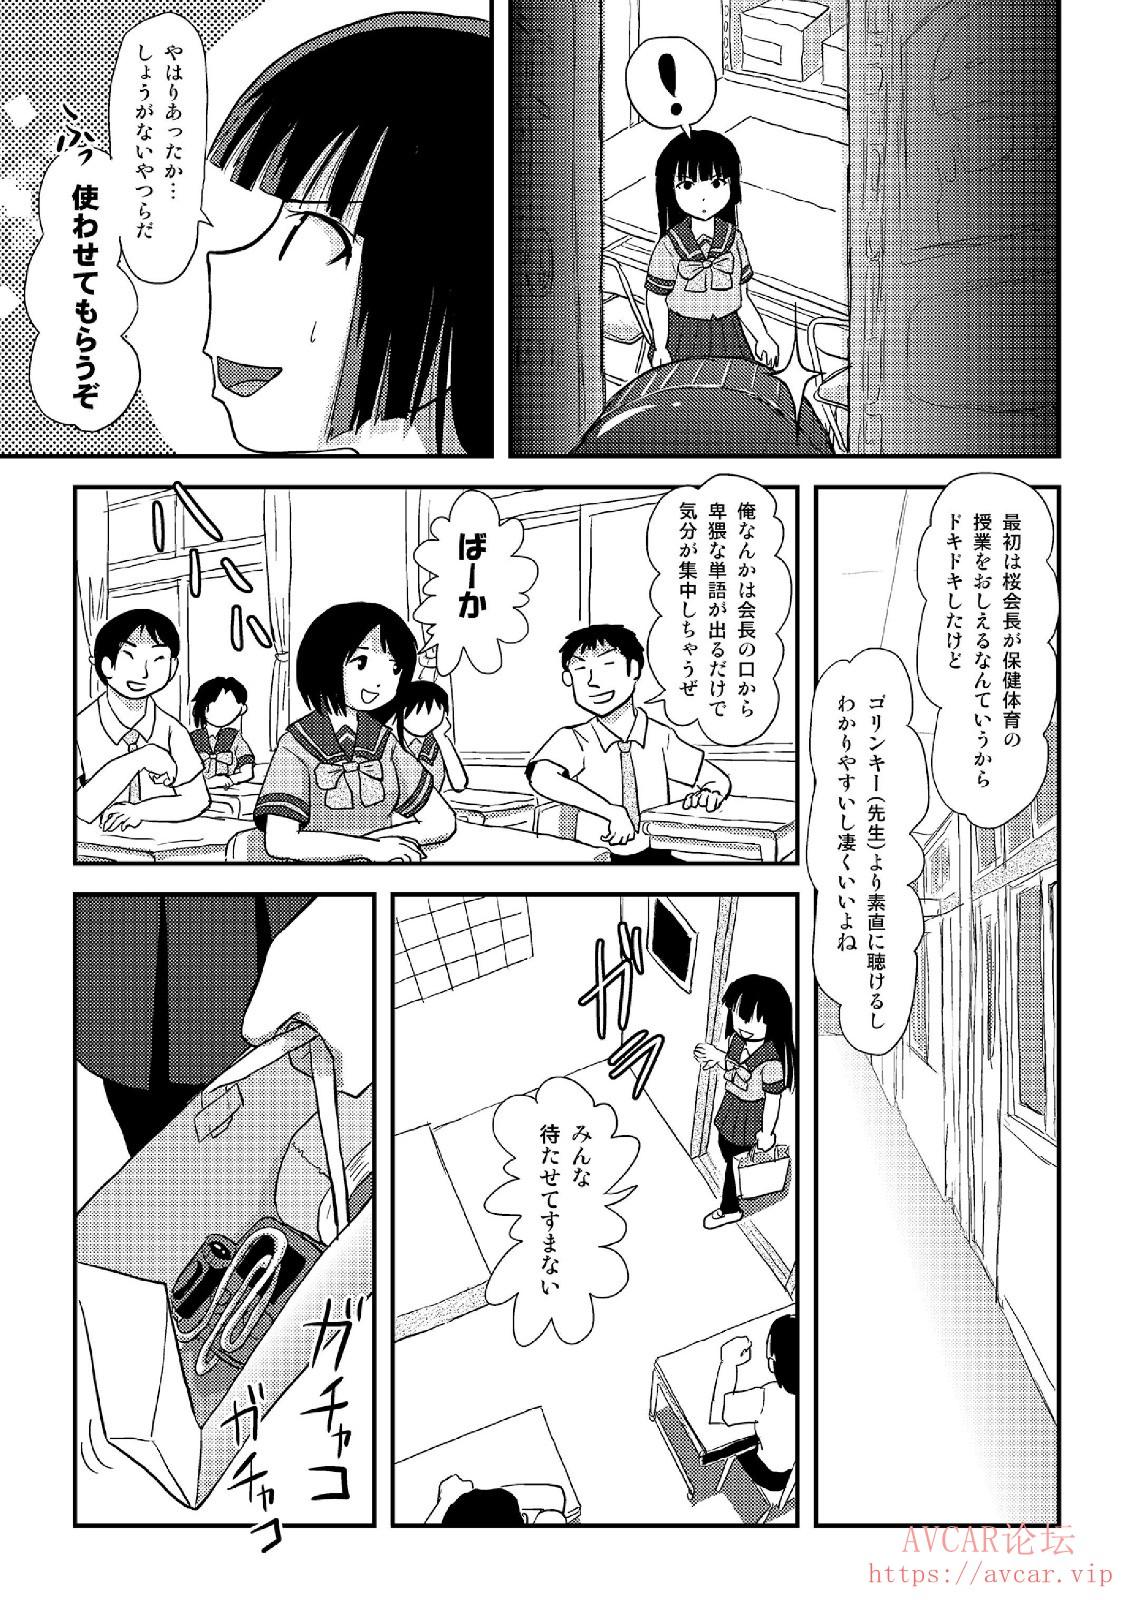 5_page_009.jpg